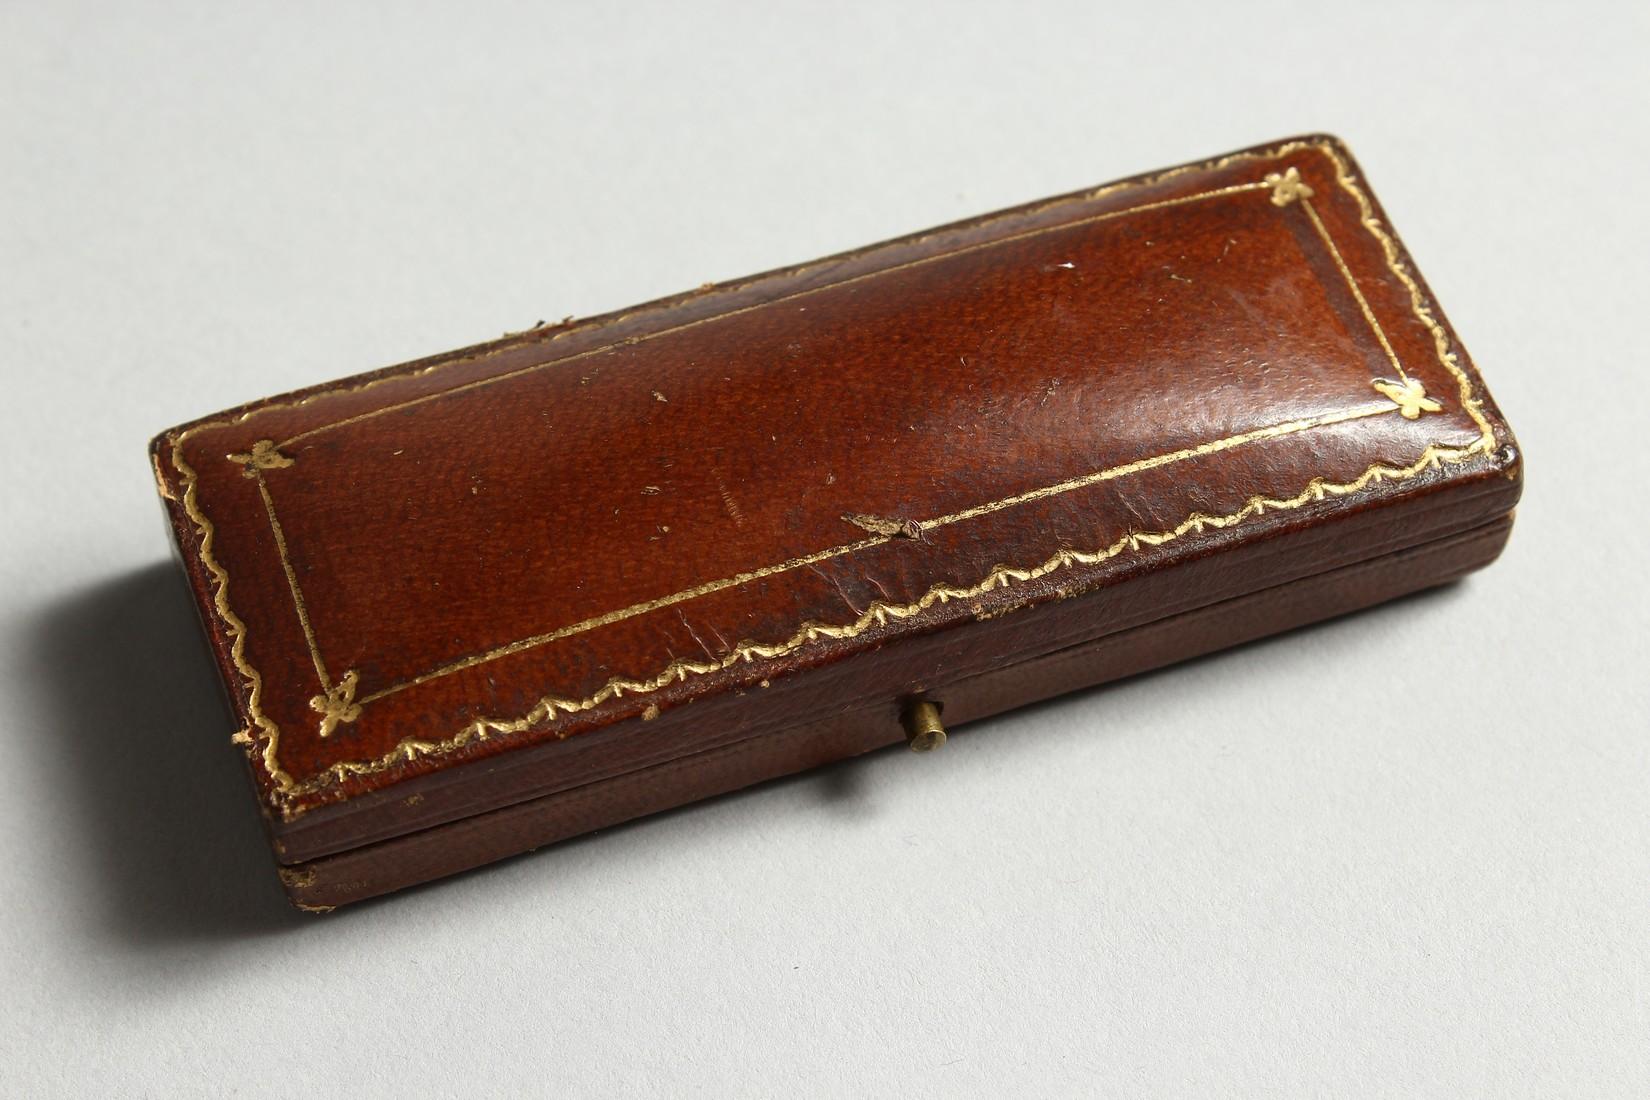 AN ARROW BROOCH PIN. - Image 7 of 7